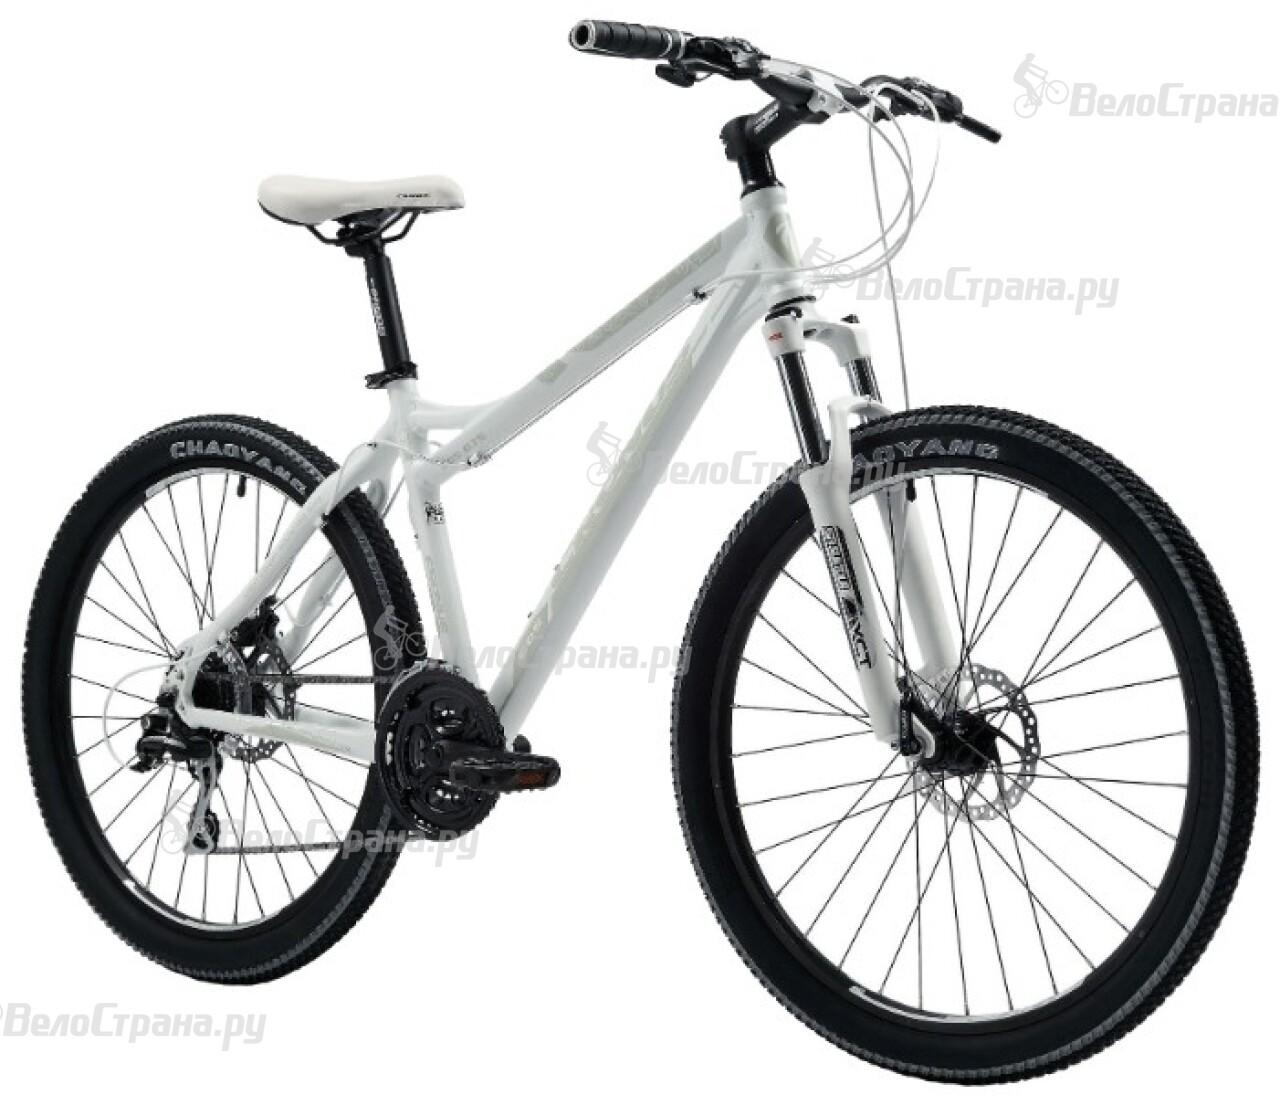 Велосипед Cronus EOS 0.75 (2014) ismartdigi lp e6 7 4v 1800mah lithium battery for canon eos 60d eos 5d mark ii eos 7d